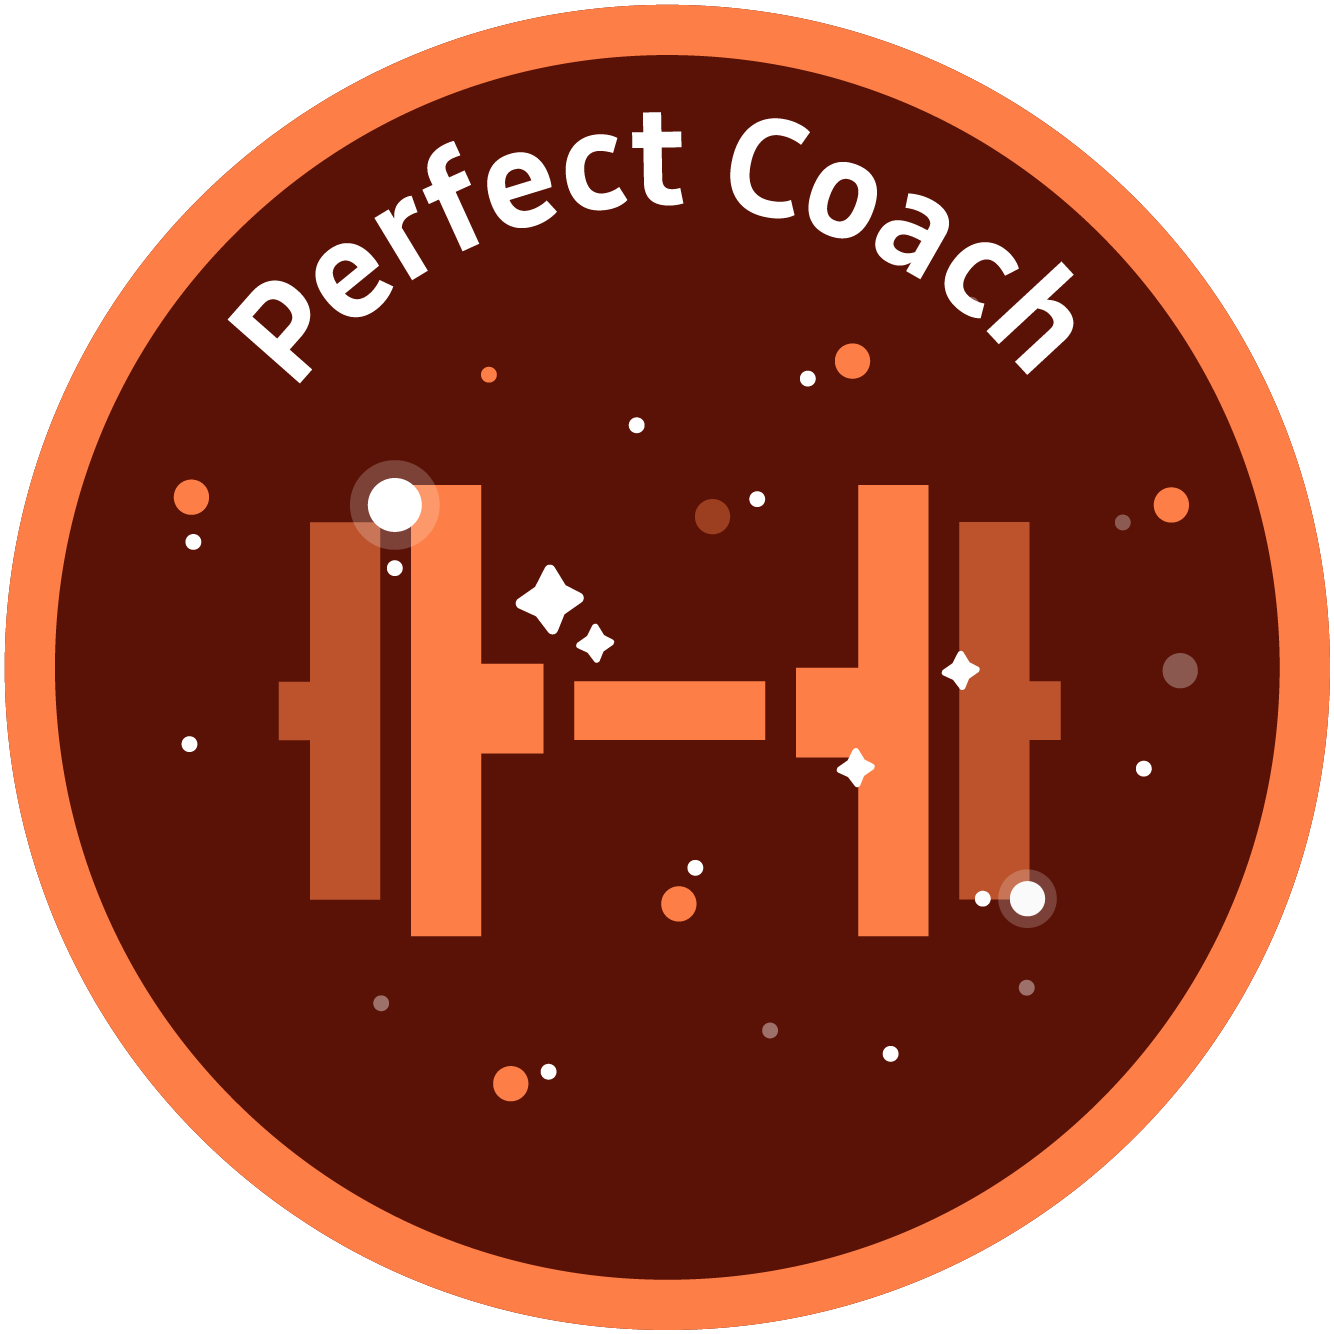 Perfect Coach